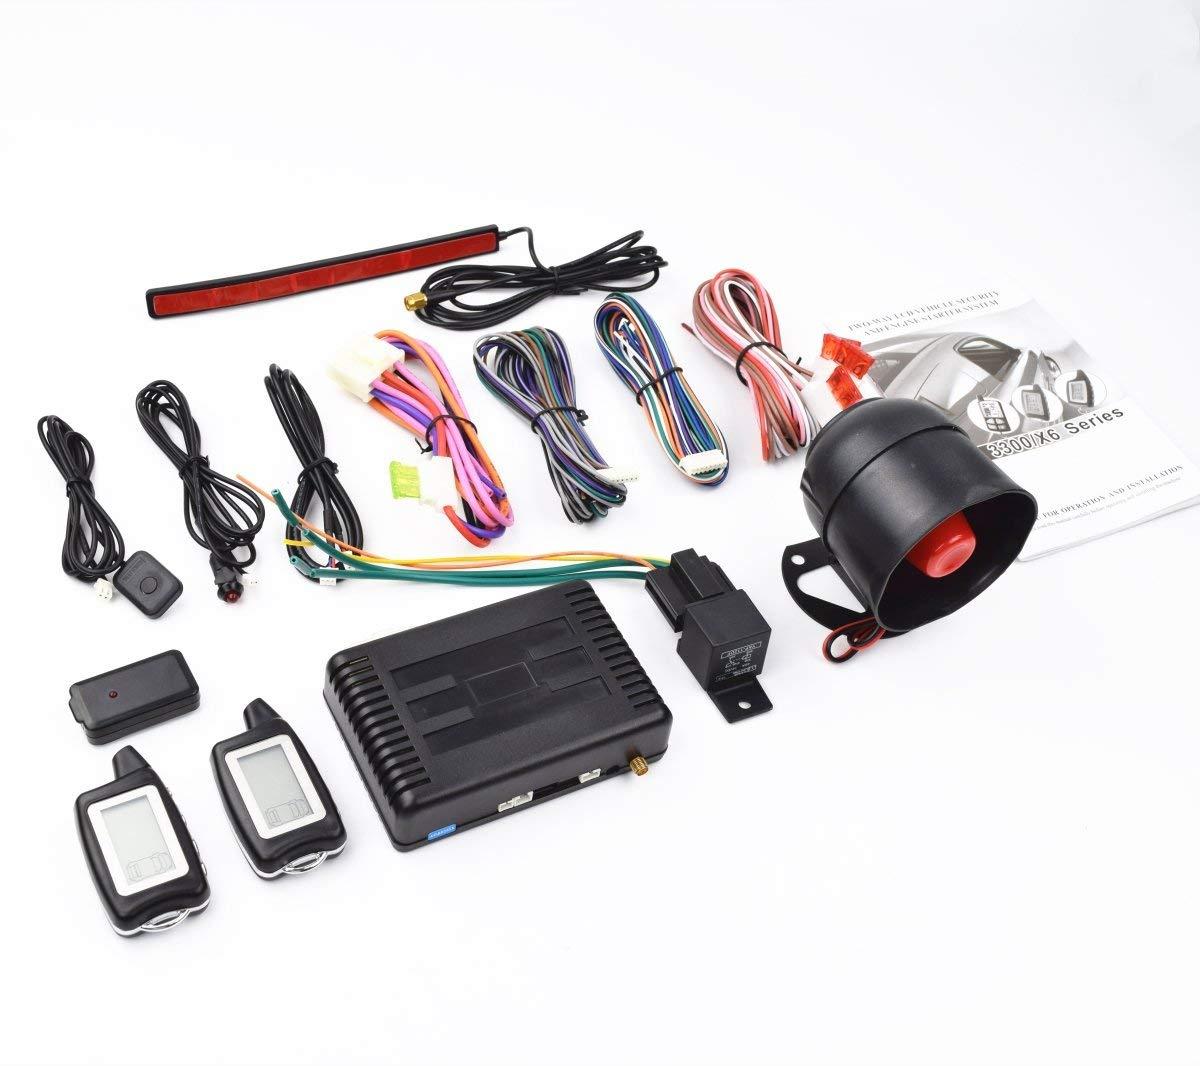 CarBest Vehicle Security Paging Car Alarm 2 Way LCD Sensor Remote Engine Start System Kit Automatic | Passive Keyless Entry(PKE) | Car Burglar Alarm System - CA-3300B